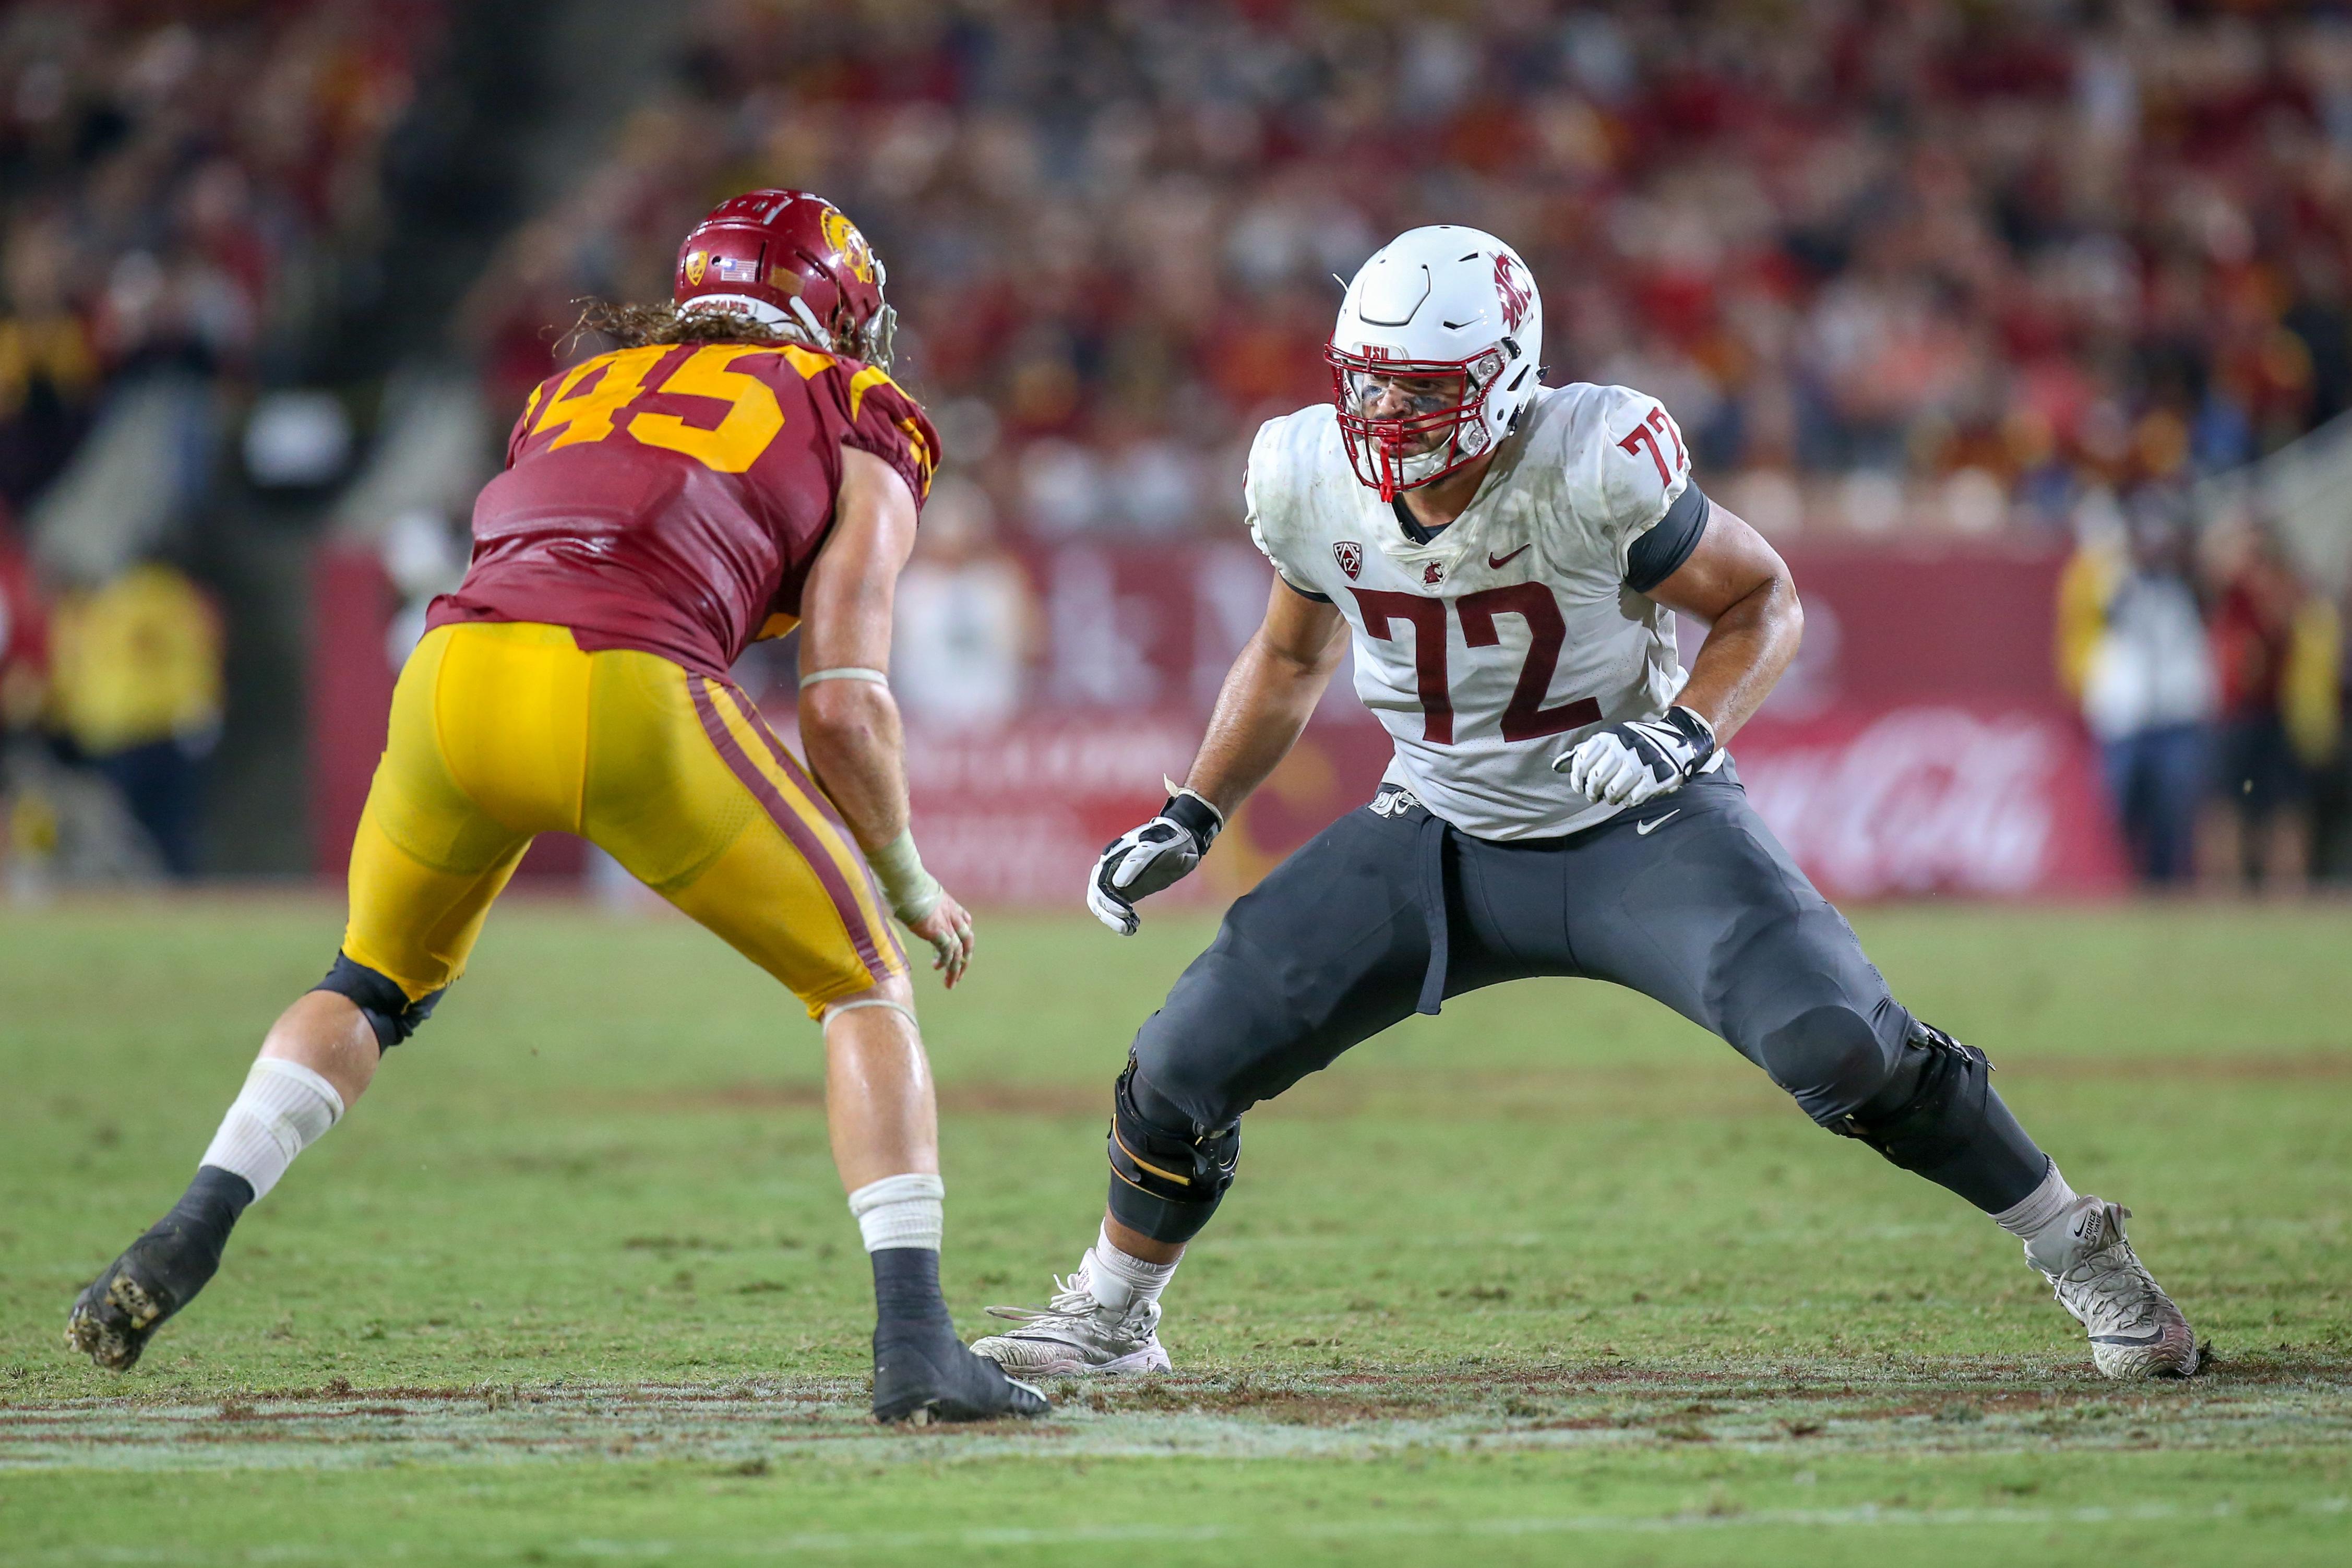 COLLEGE FOOTBALL: SEP 21 Washington State at USC